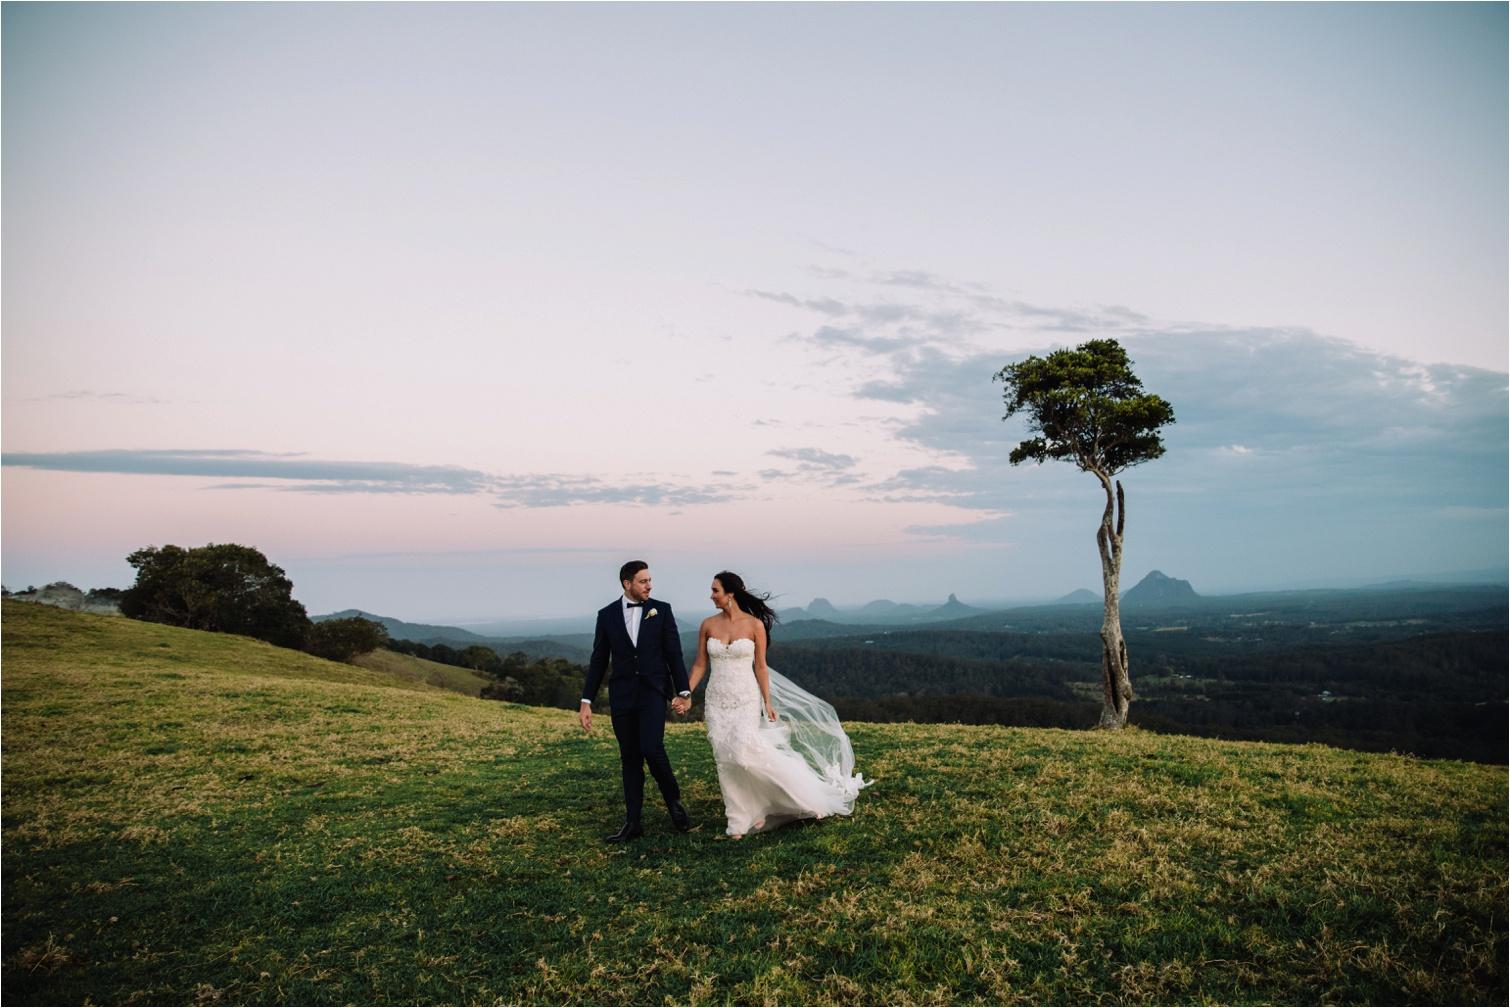 Maleny Manor Wedding Photography - Gold Coast Wedding Photographer_0056.jpg